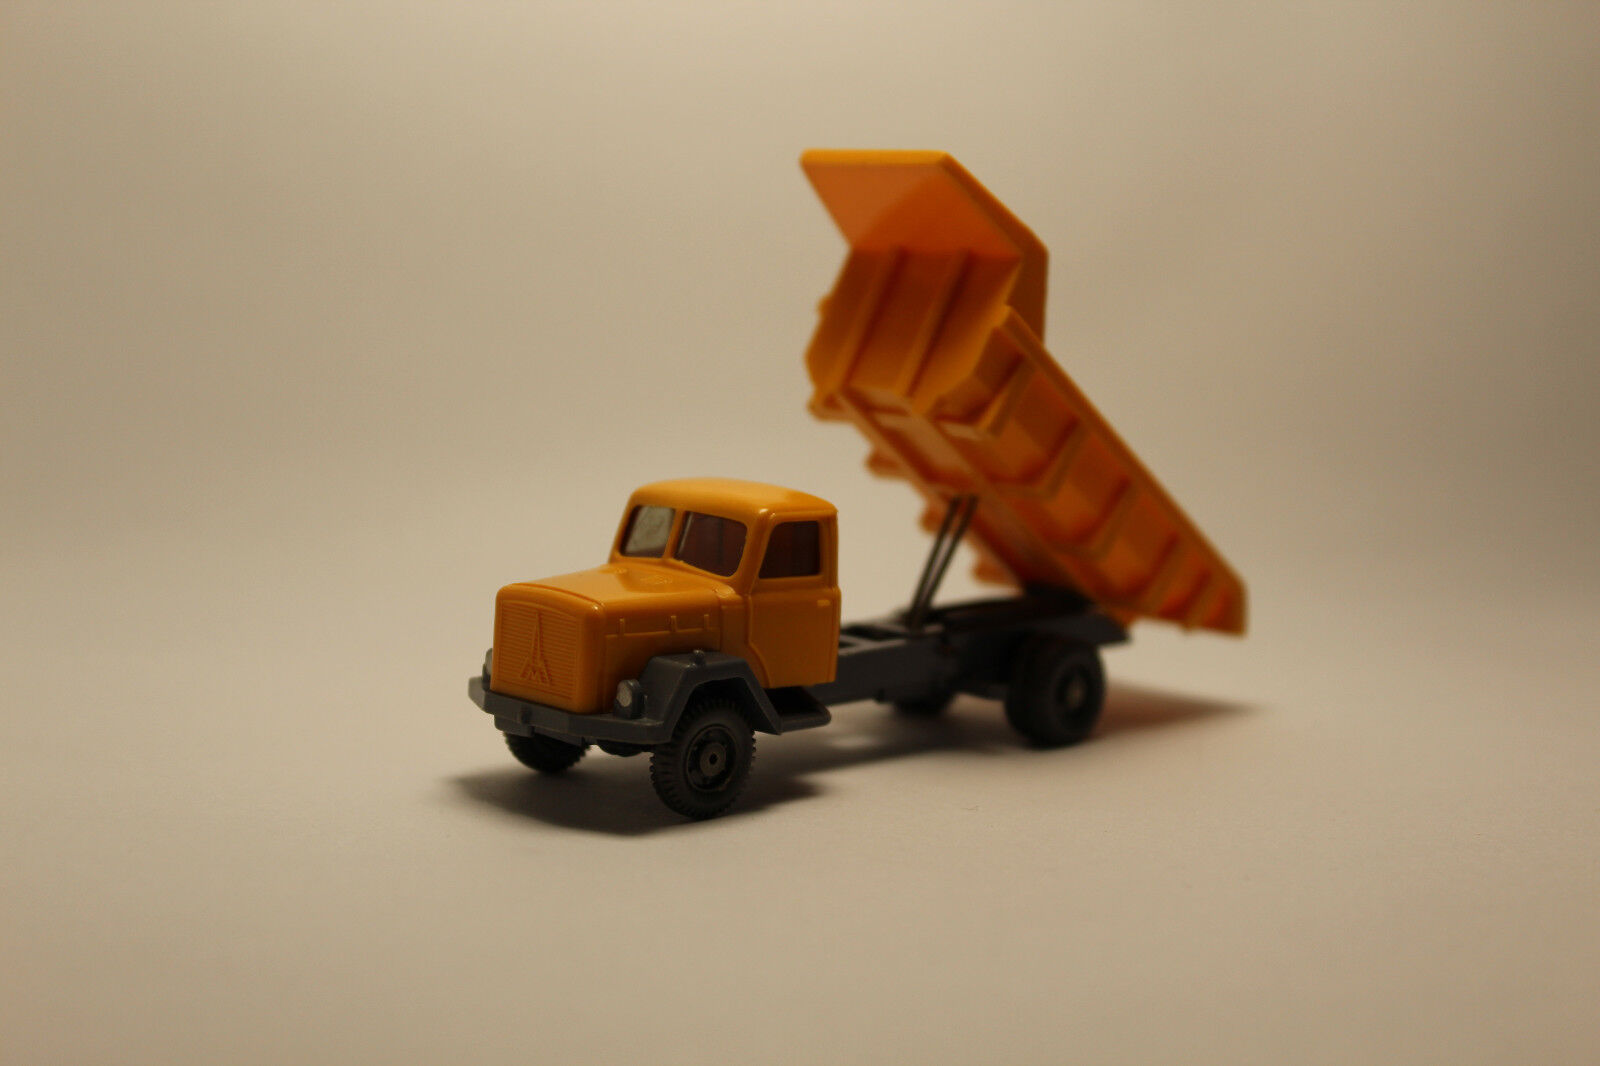 A.s.s Wiking edad camiones Saturn camiones camiones camiones de volteo 2-achsig GK 670 4b CS 1110 3b 1.w Top d33c87